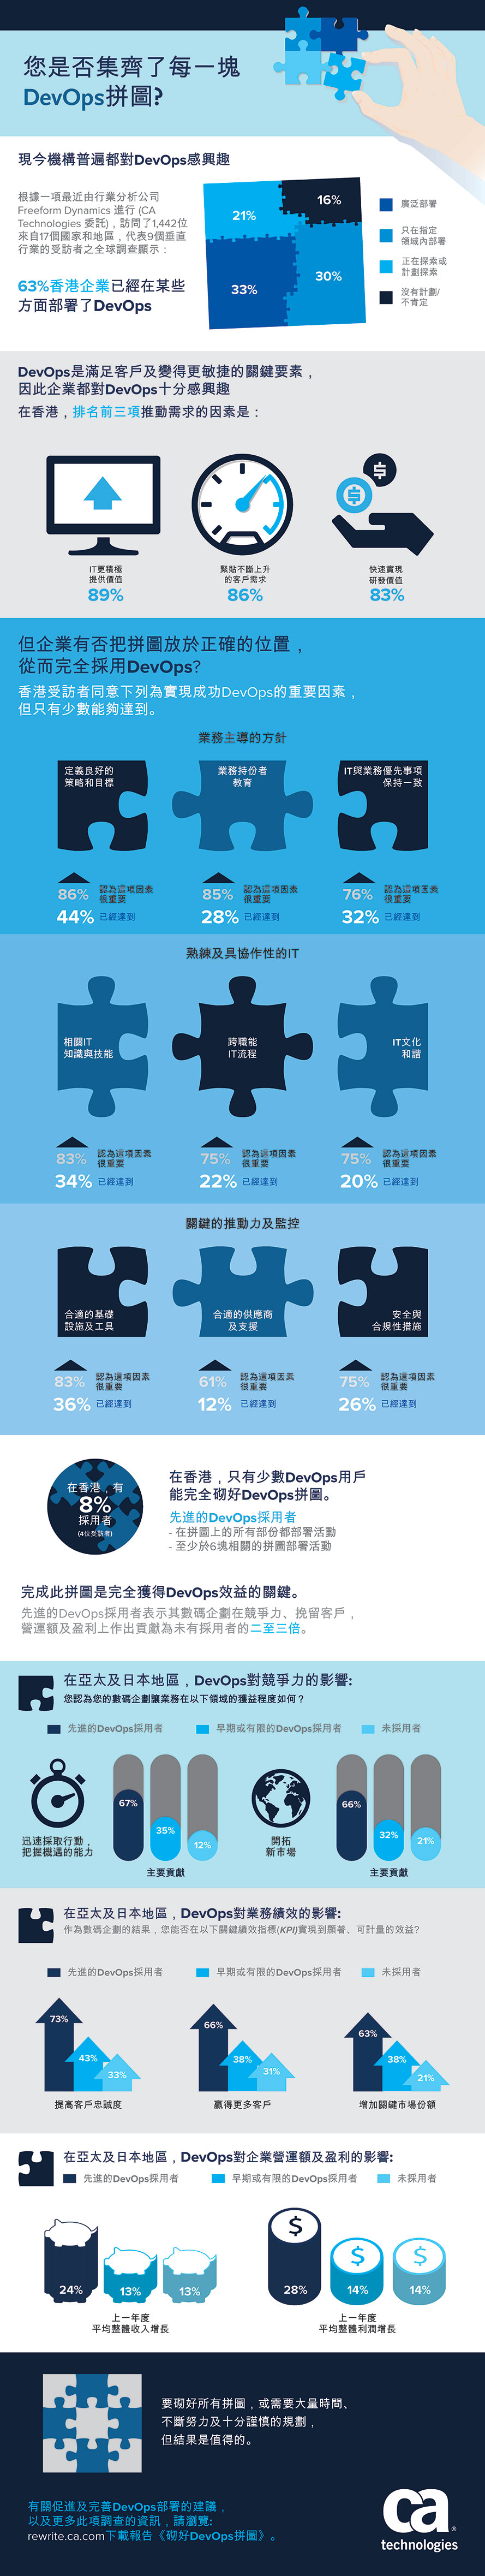 ca-devops-infographic_final_HK_FINAL